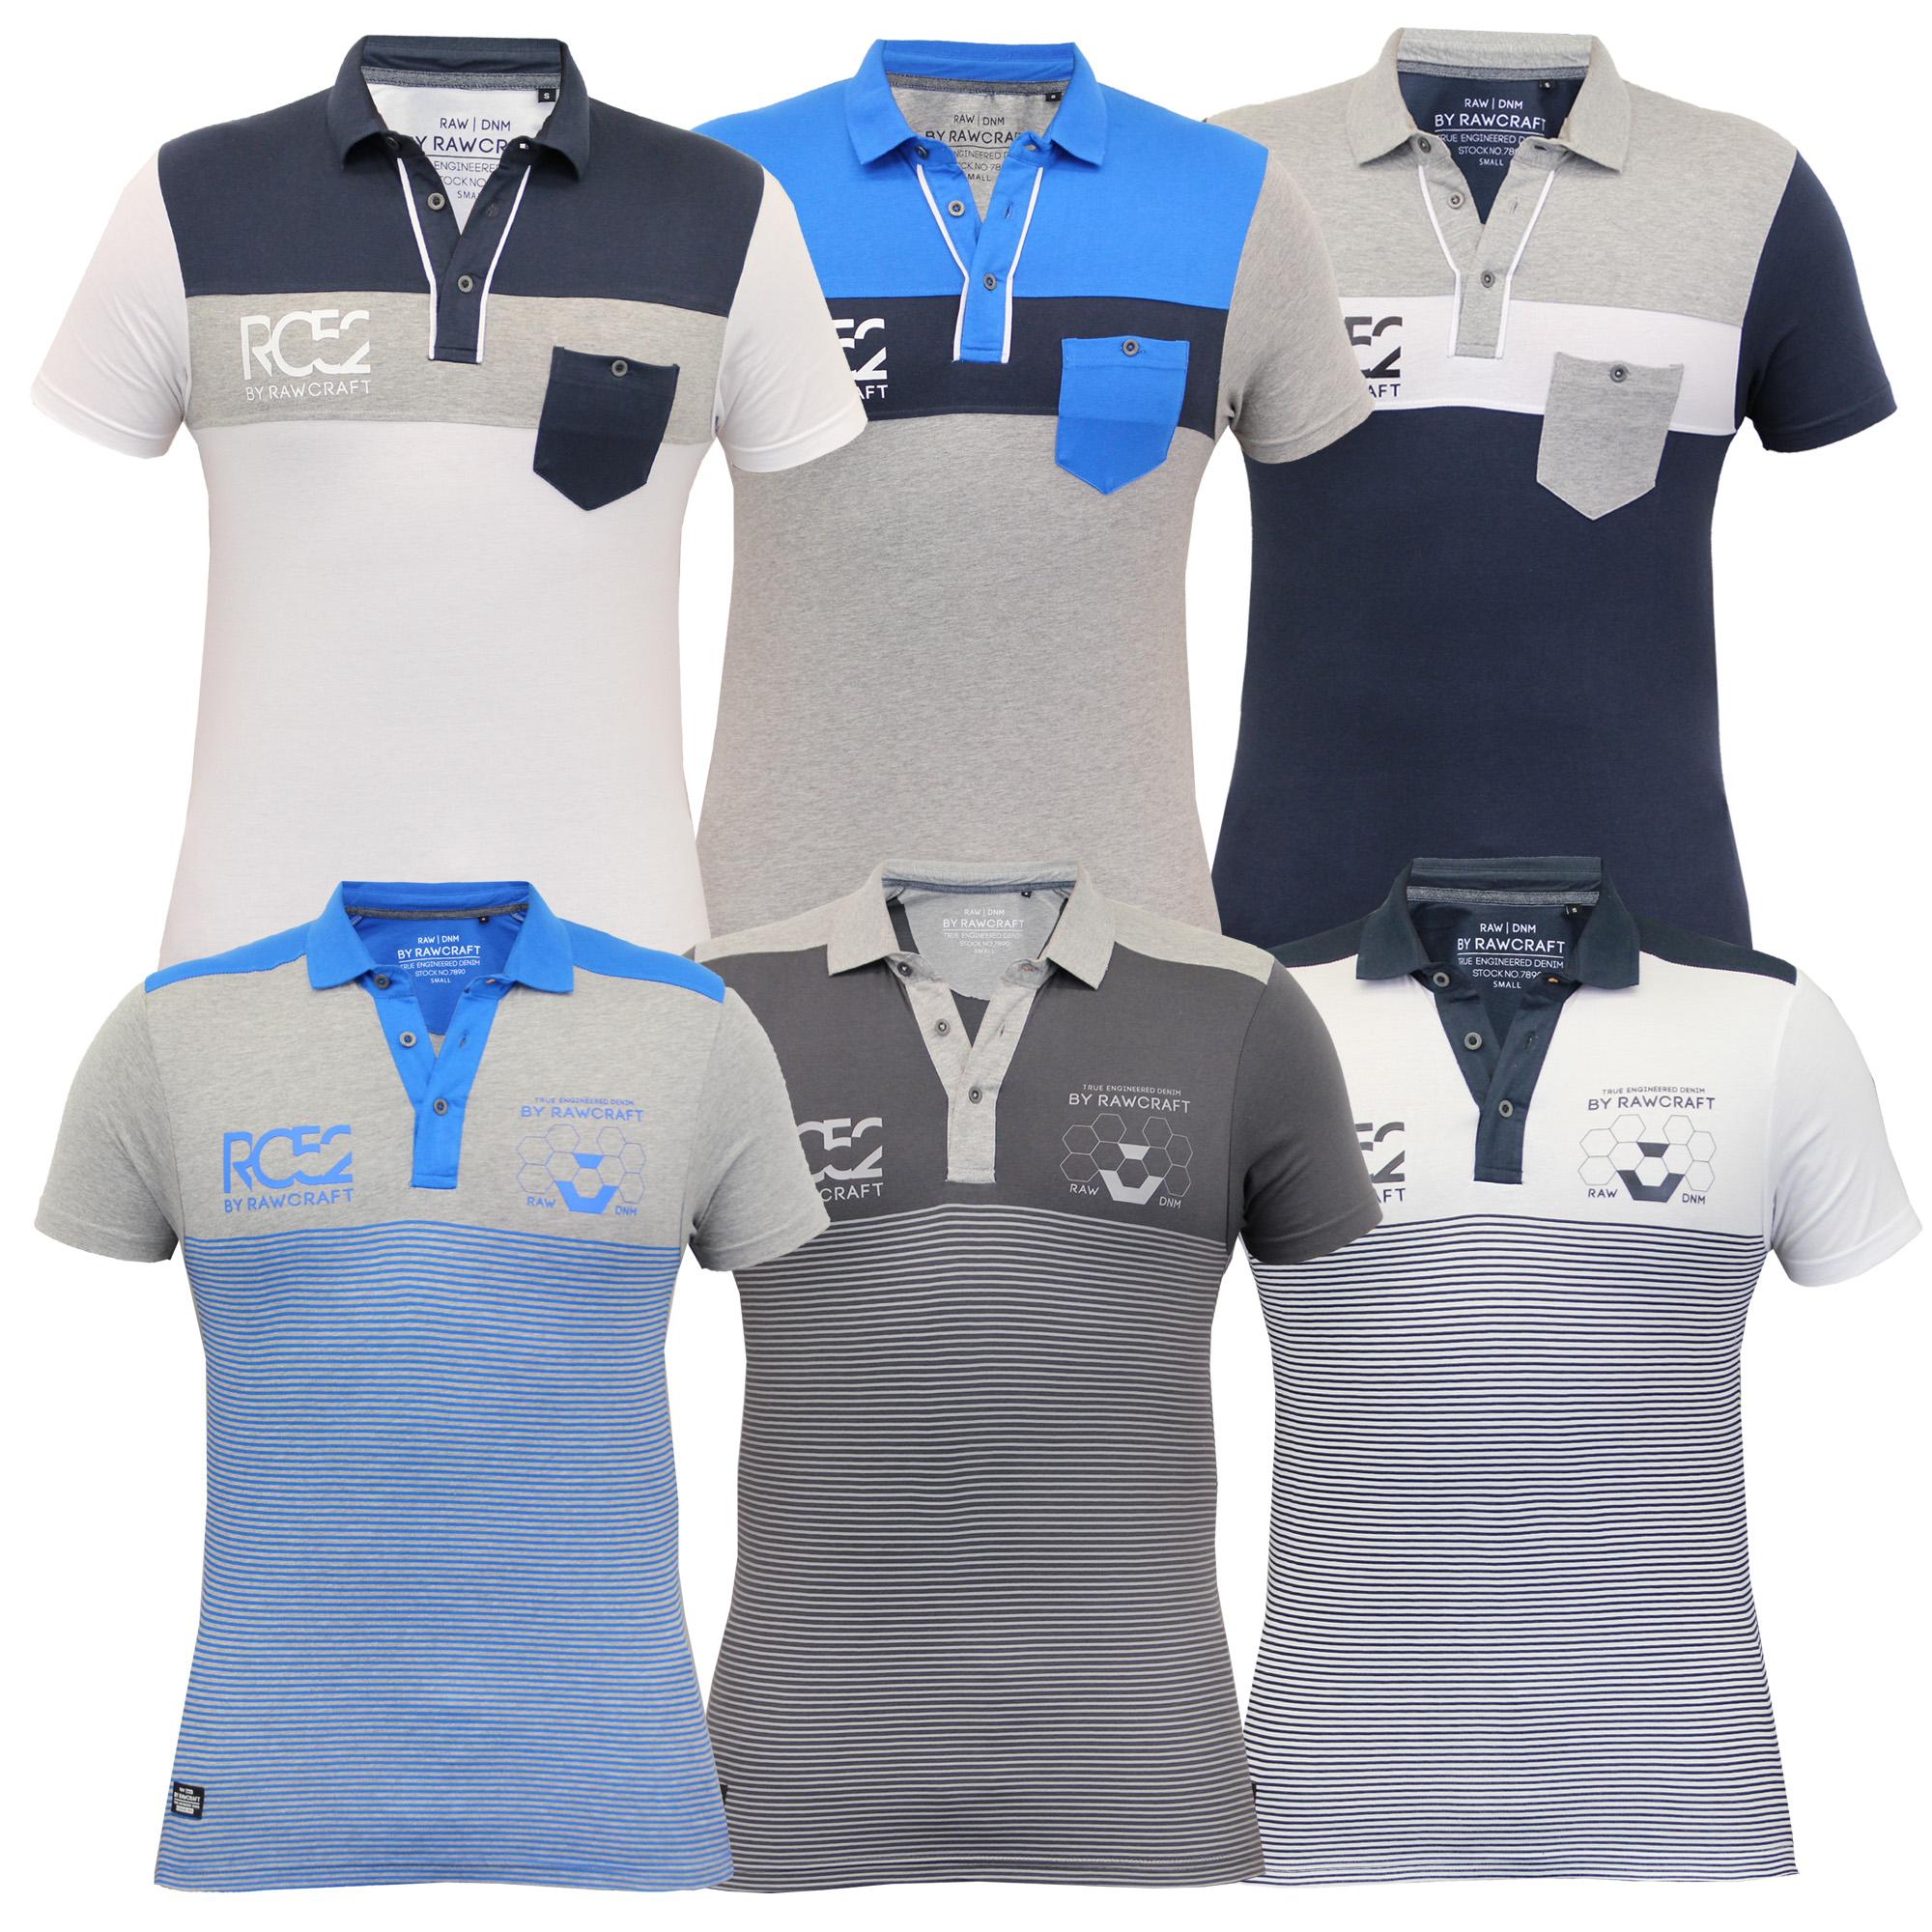 c1572ff216a Boys Polo T Shirt Rawcraft Kids Pique Striped Top Jersey Short ...